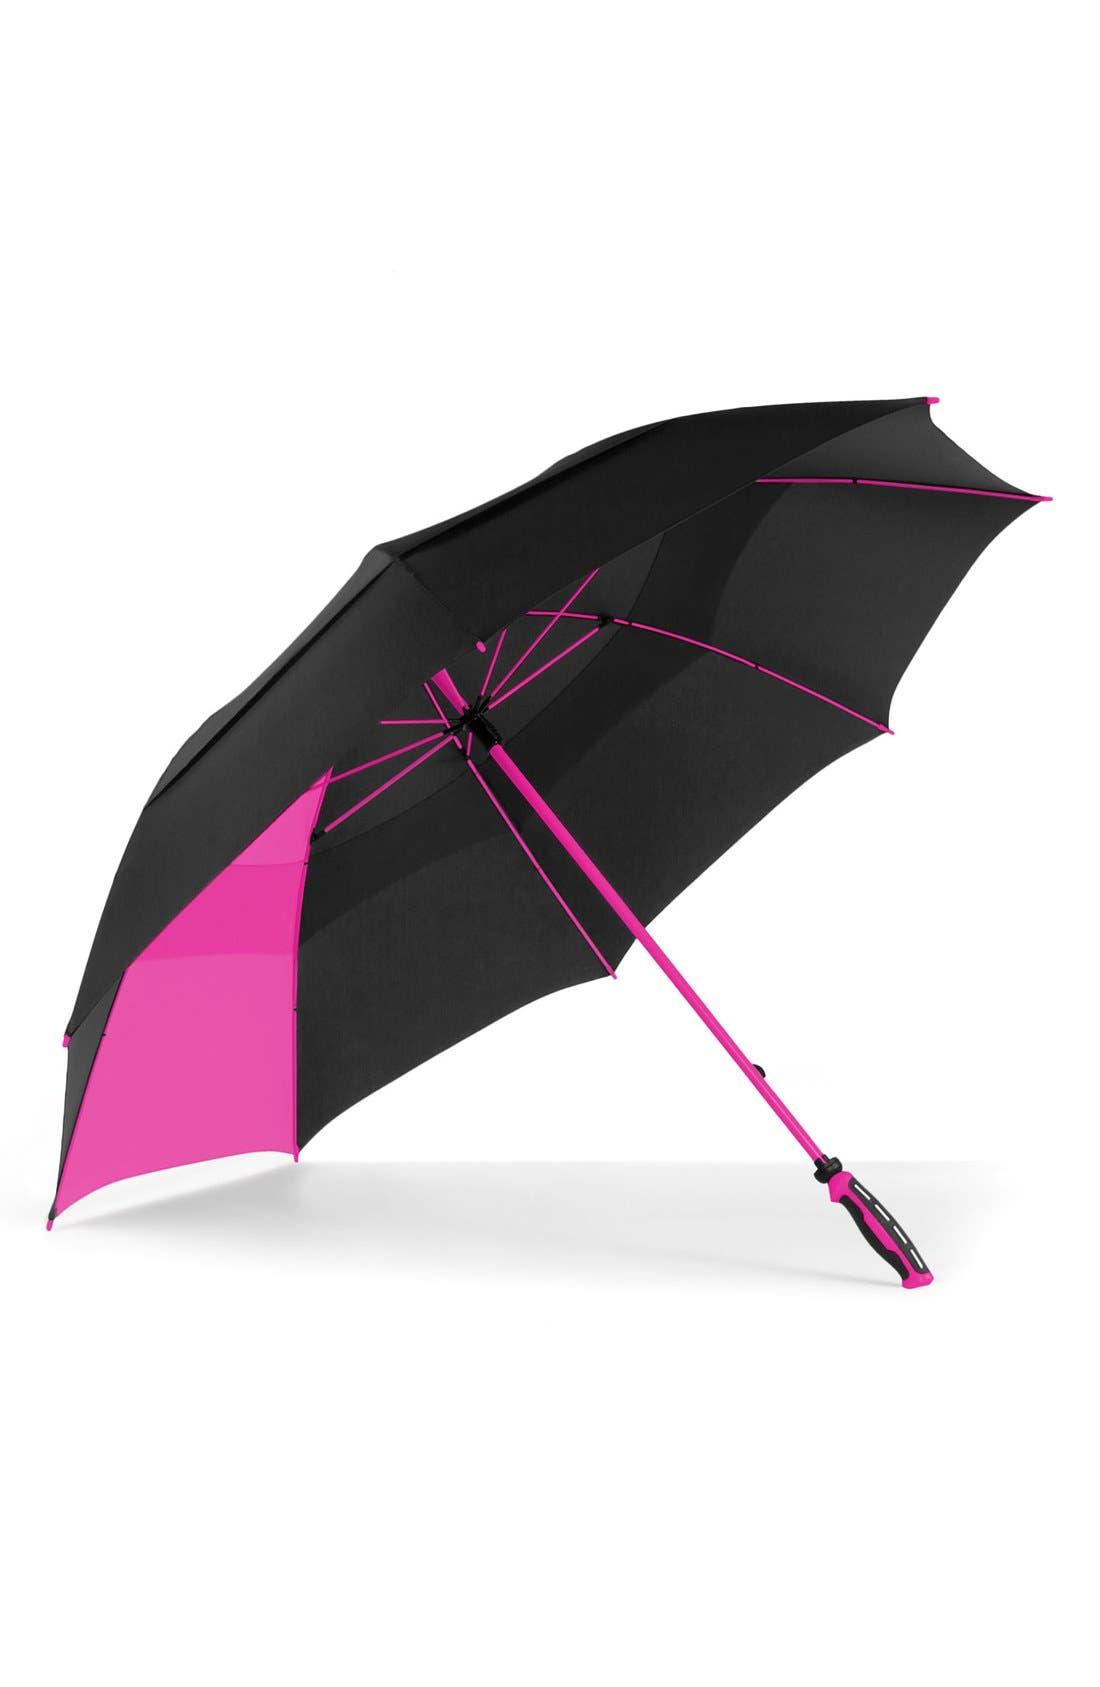 'WindJammer<sup>®</sup>' Golf Umbrella,                             Main thumbnail 1, color,                             BLACK/ PINK